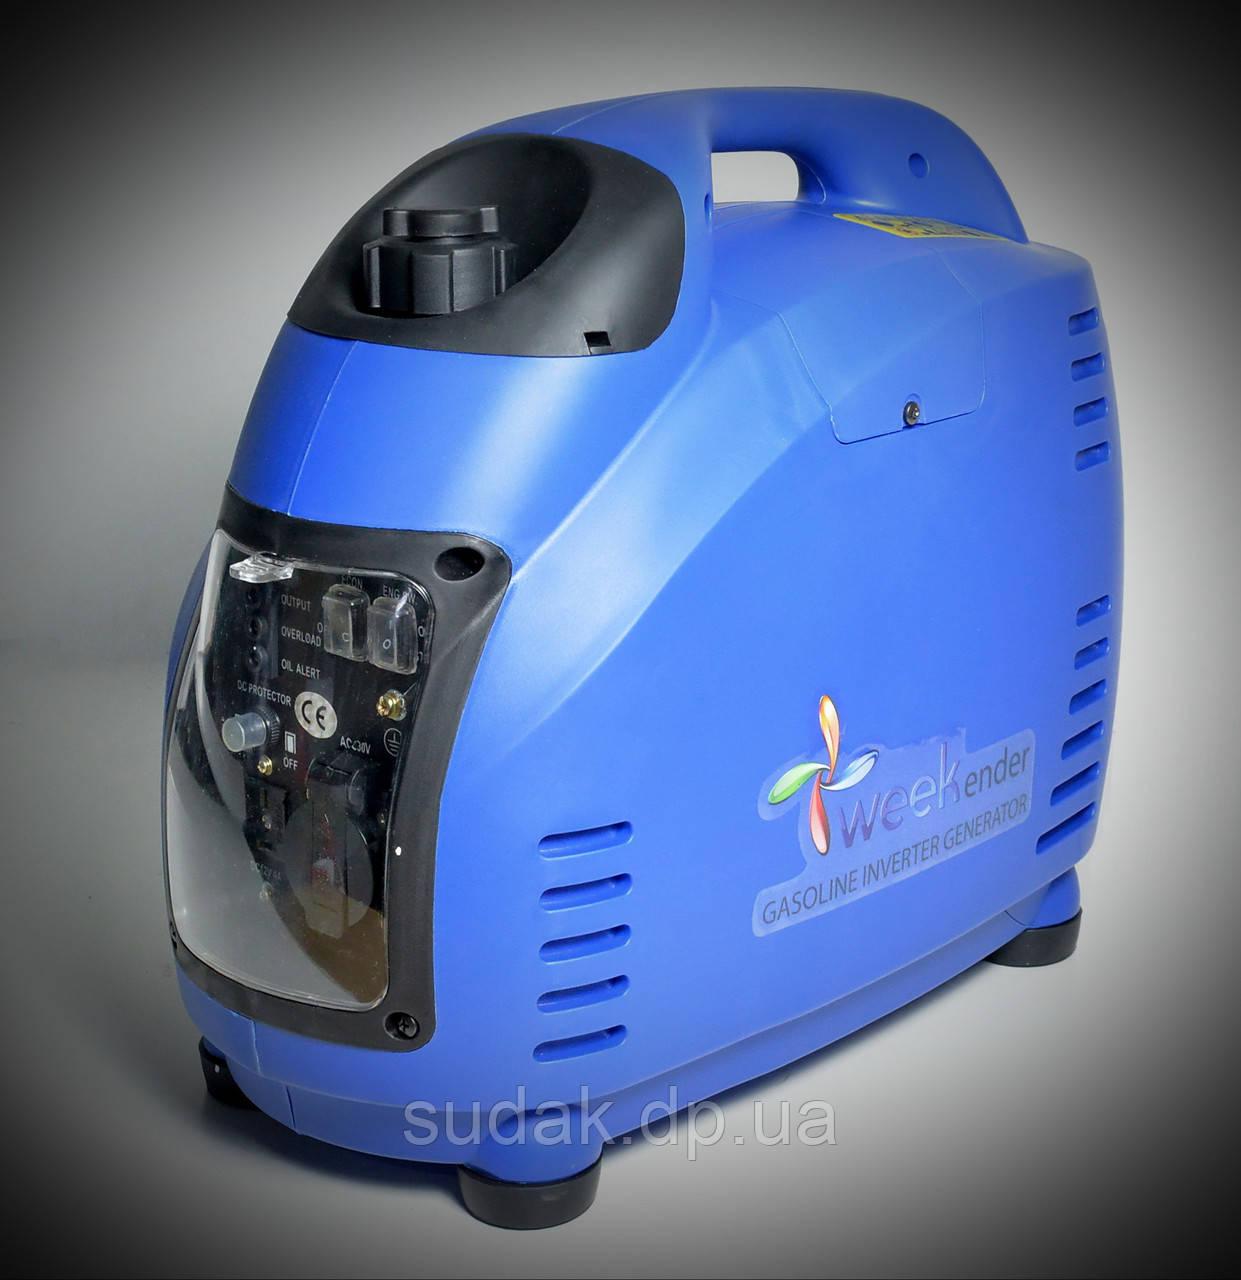 Генератор-інвертор Weekender D1800i